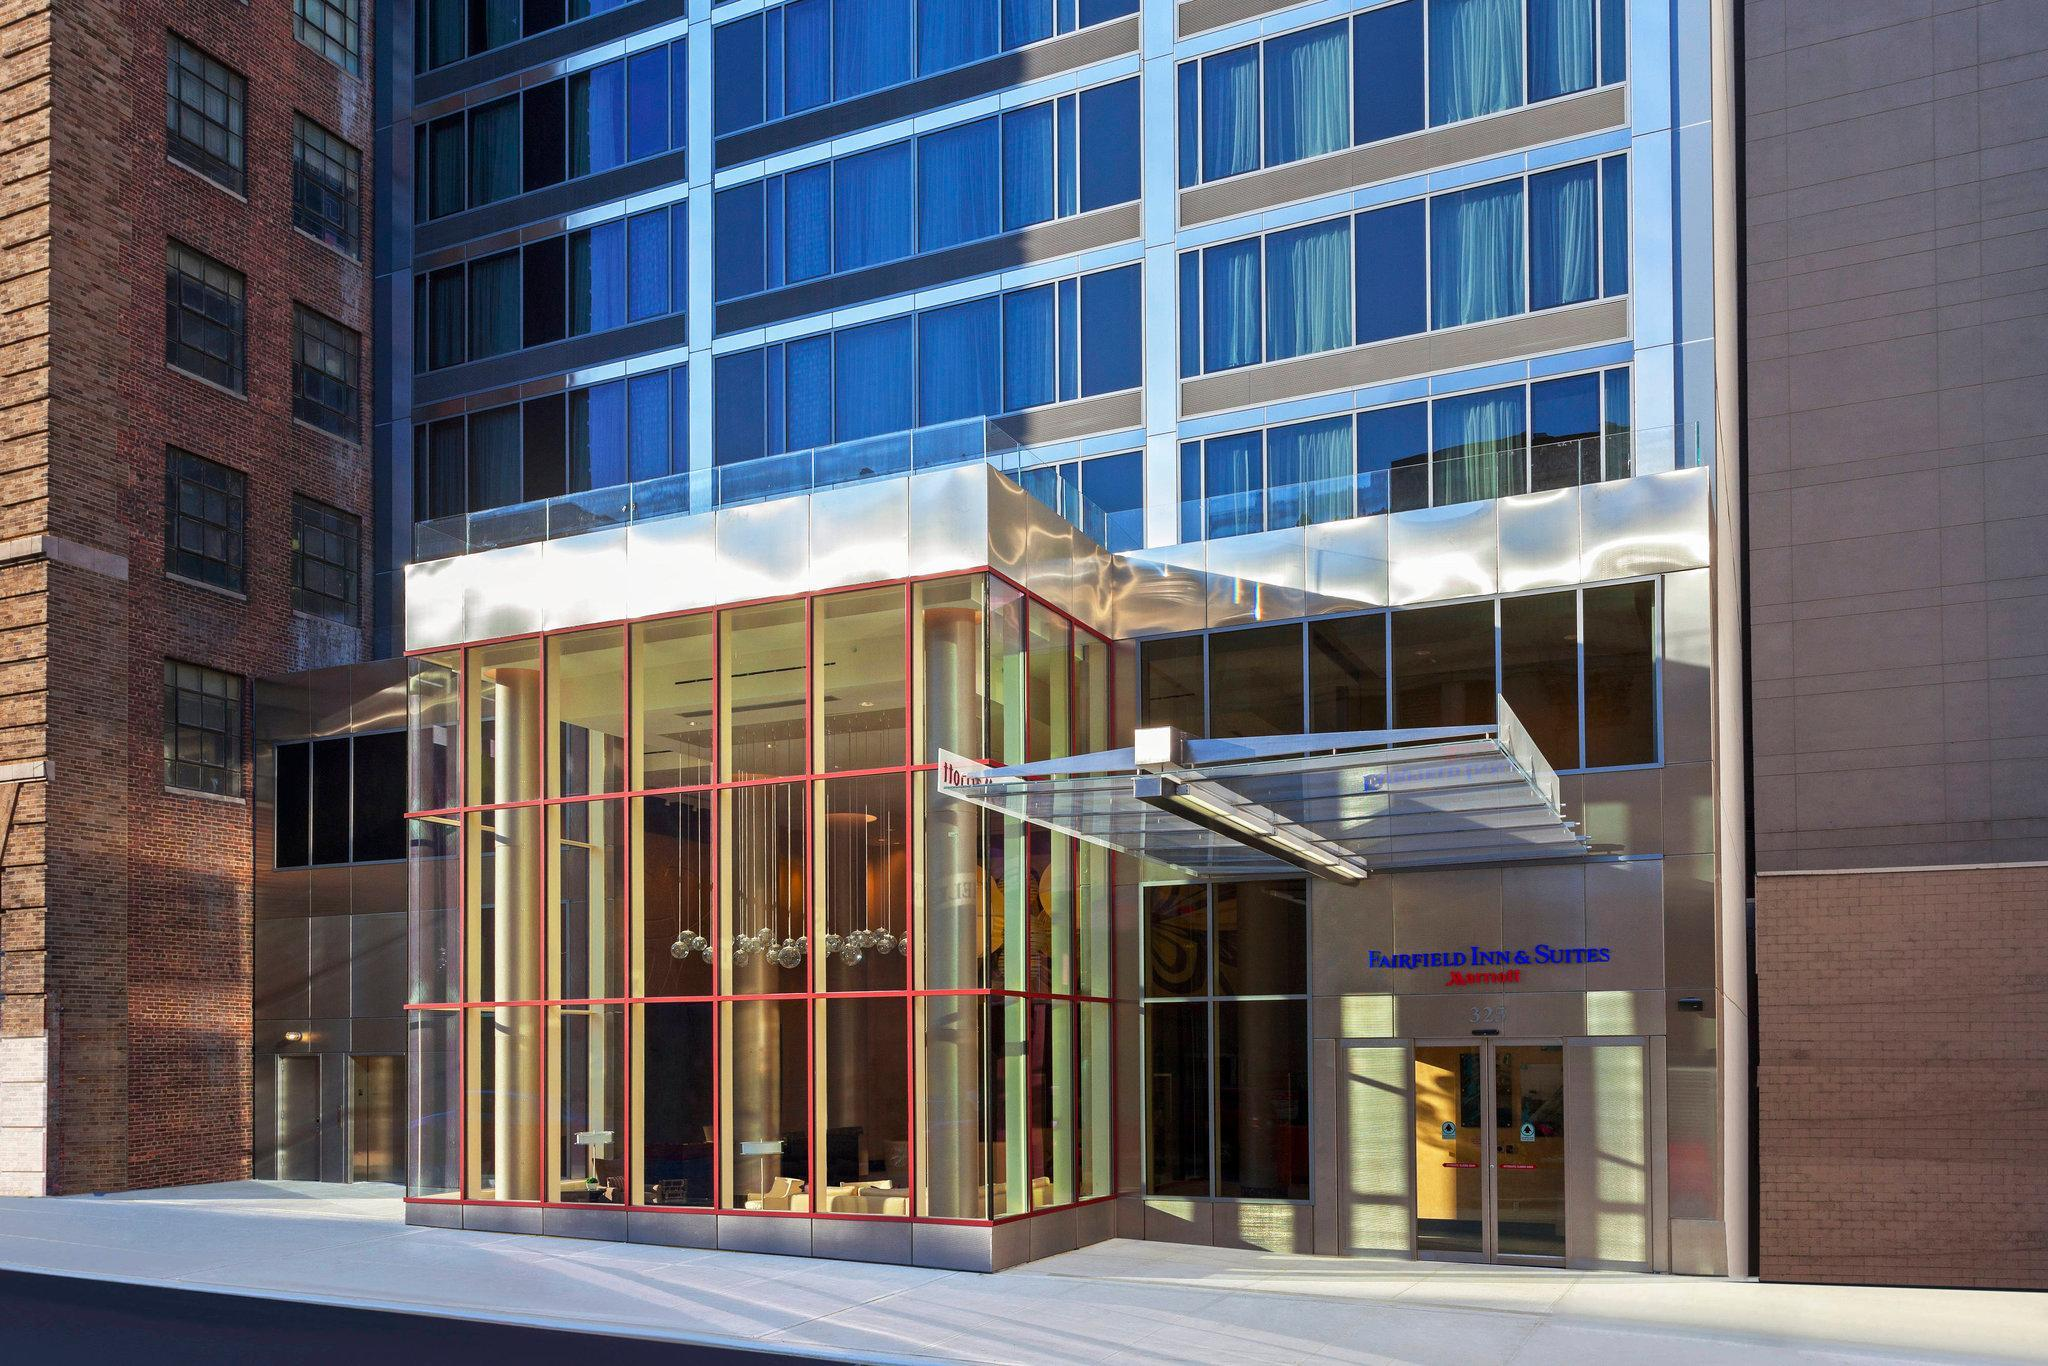 Fairfield Inn And Suites New York Midtown Manhattan Penn Station